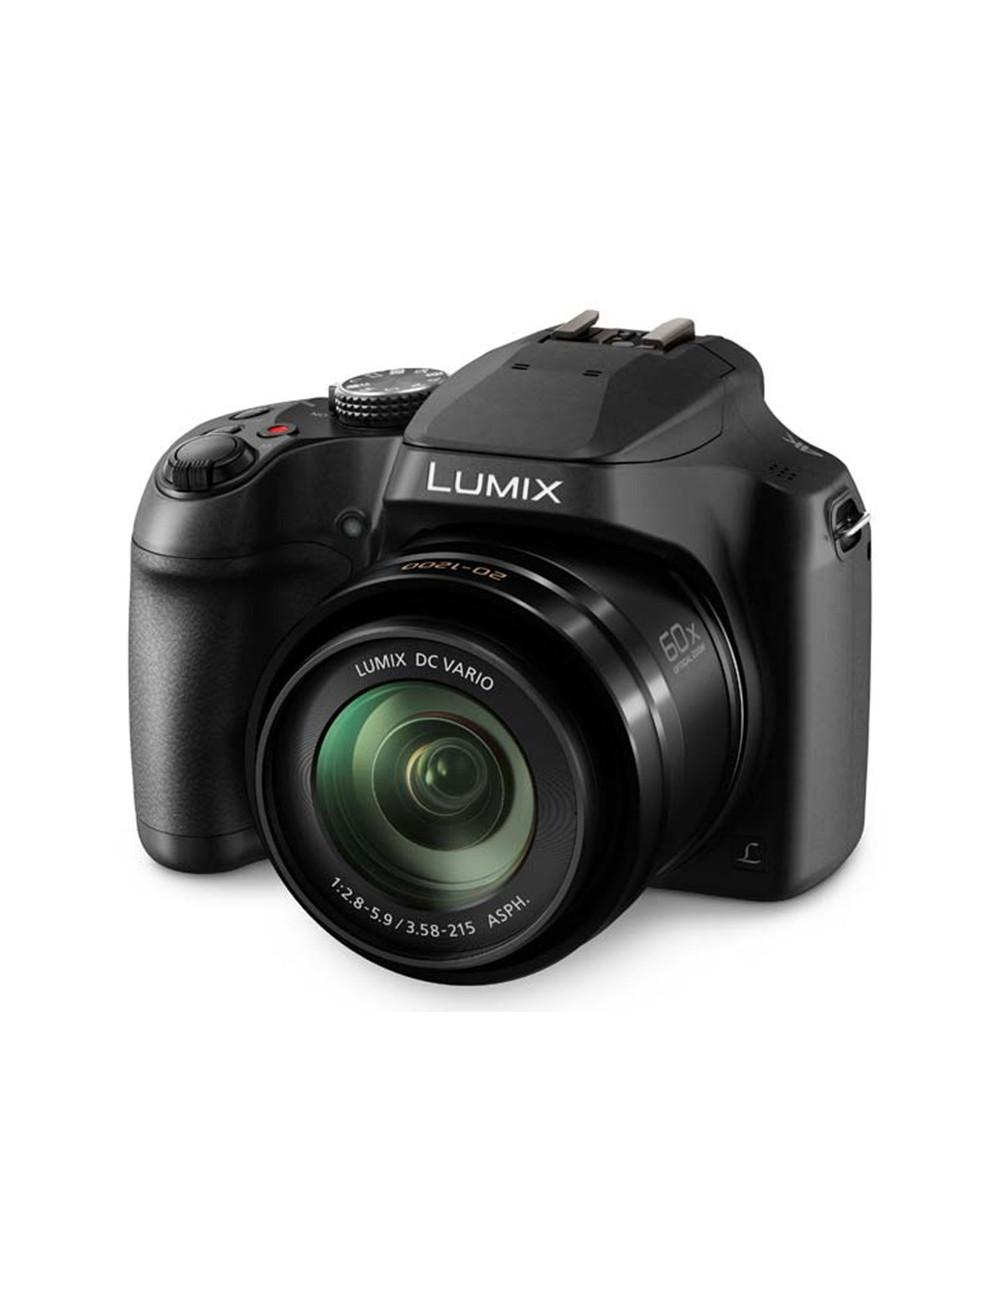 Lente Fujifilm XF 50-140mm f/2.8 R LM OIS WR Teleobjetivo Zoom Muy versátil